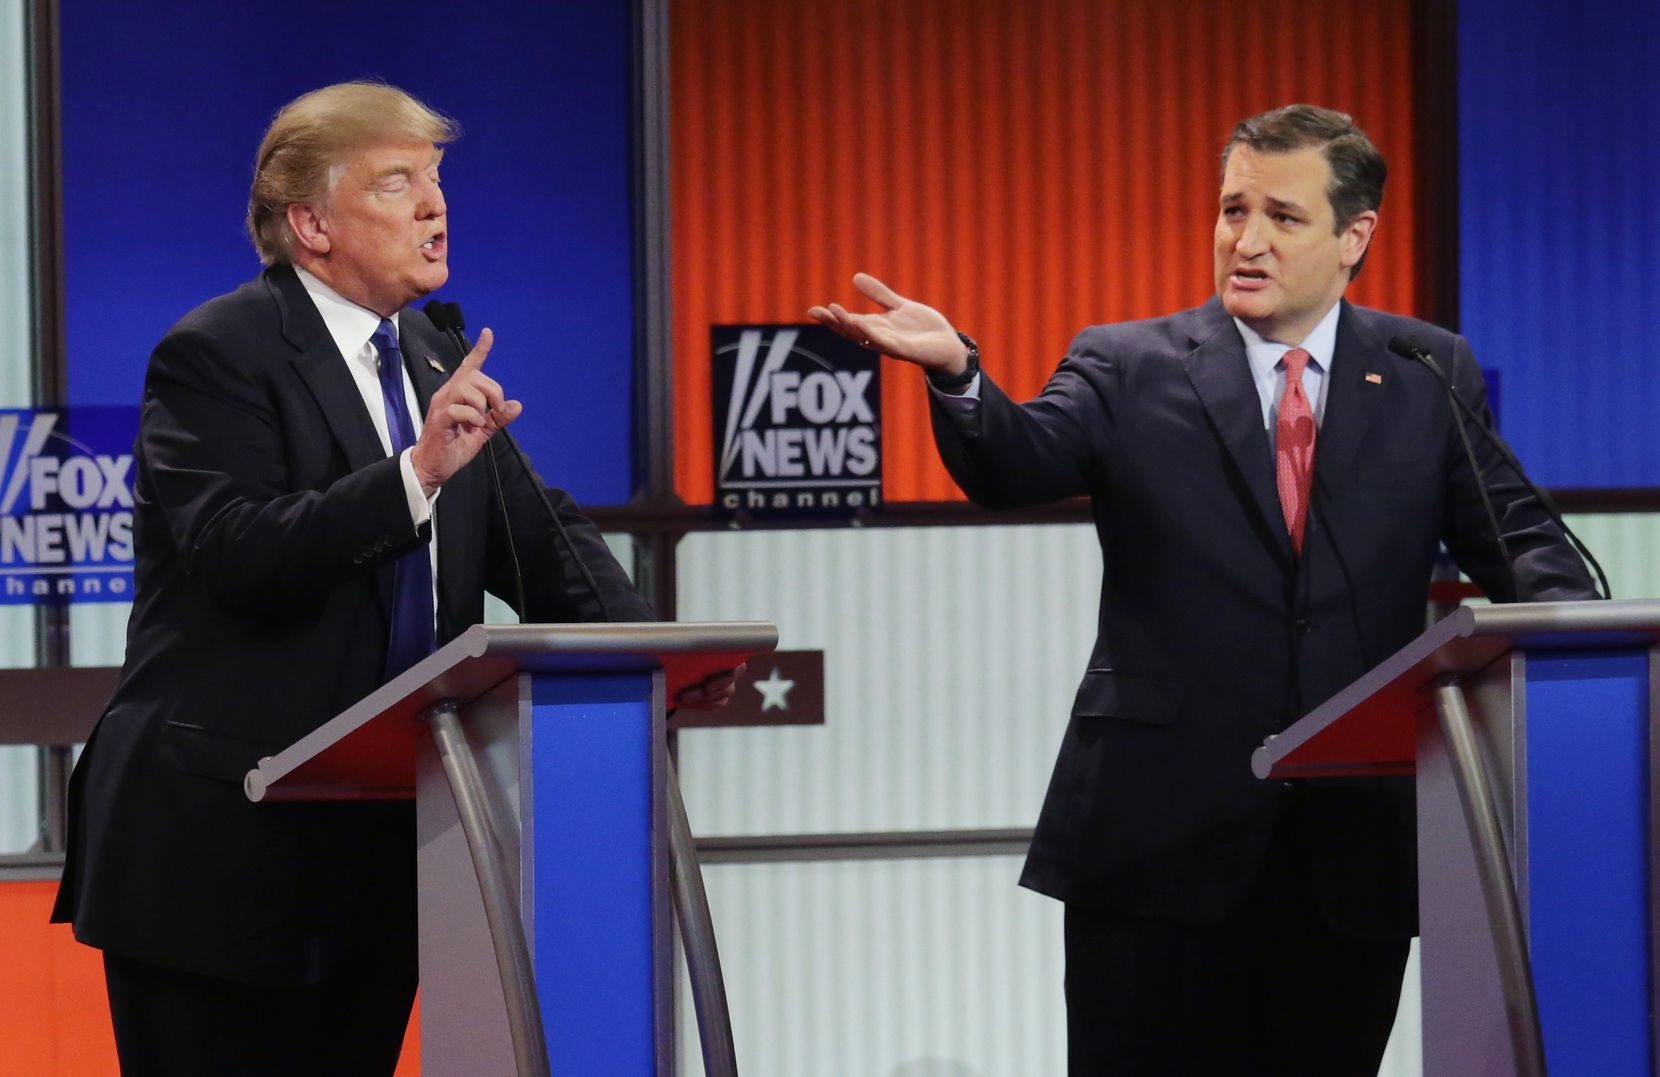 Donald Trump and Sen. Ted Cruz squabble during a Republican presidential debate March 3, 2016 in Detroit.